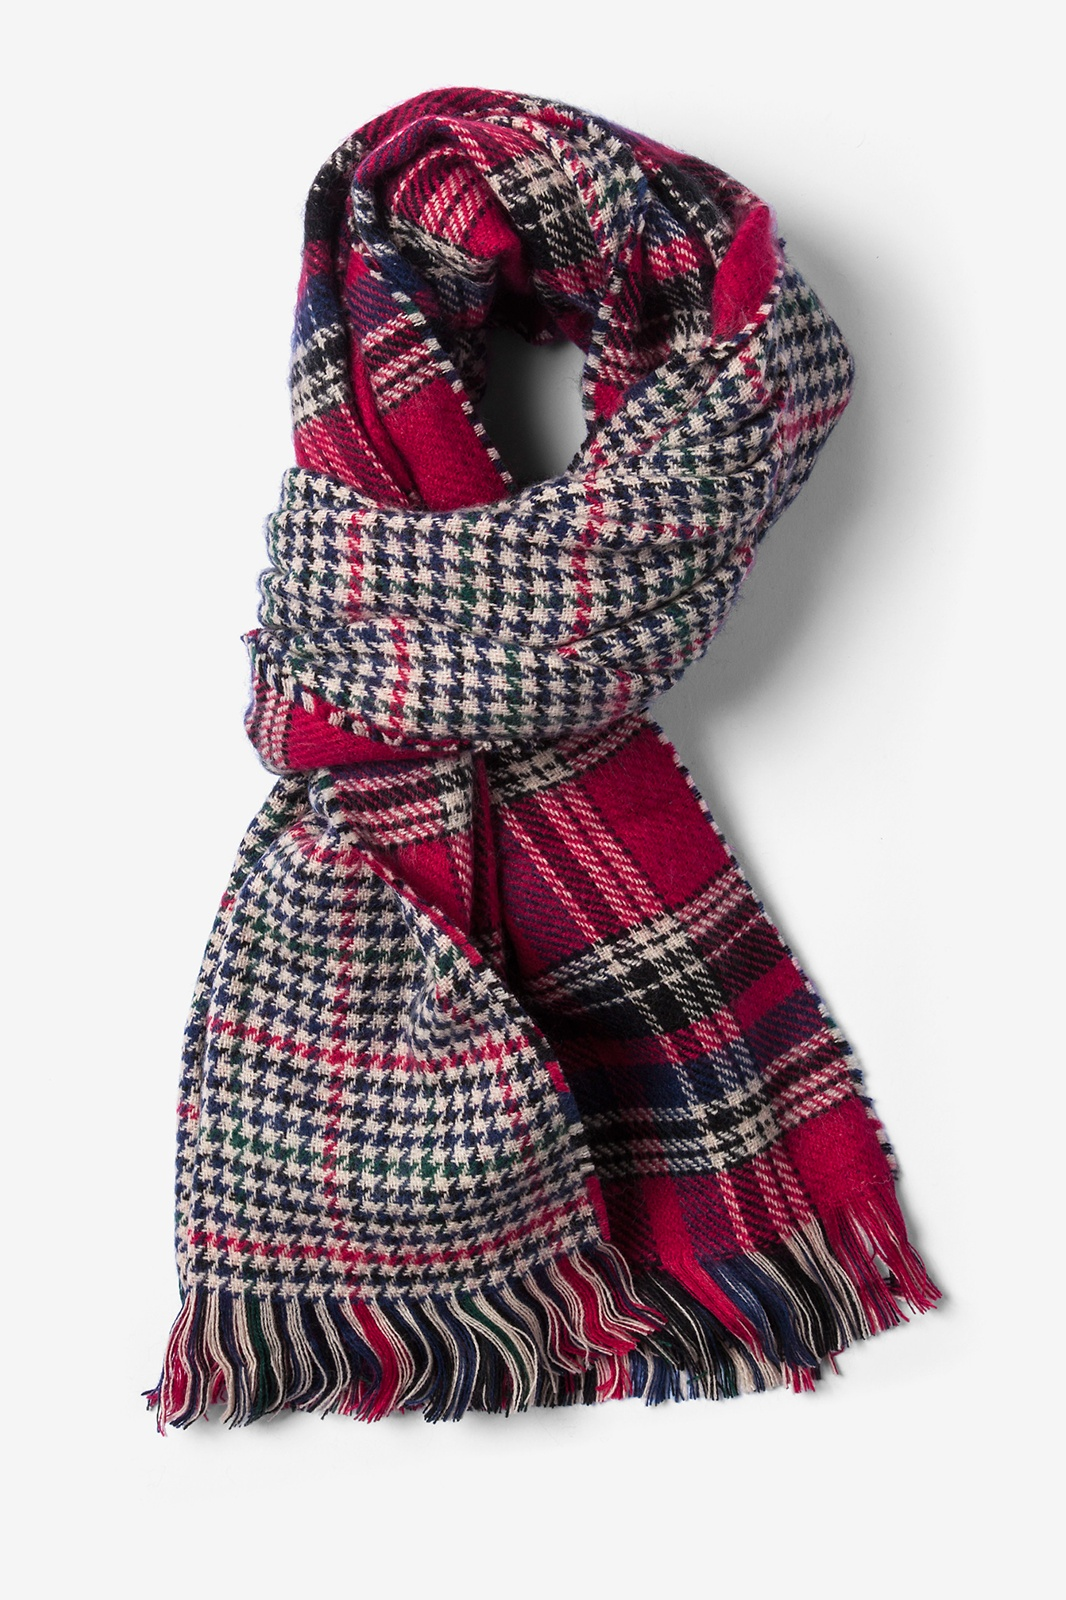 tartan scarves edinburgh tartan scarf by scarves.com LFABWEP